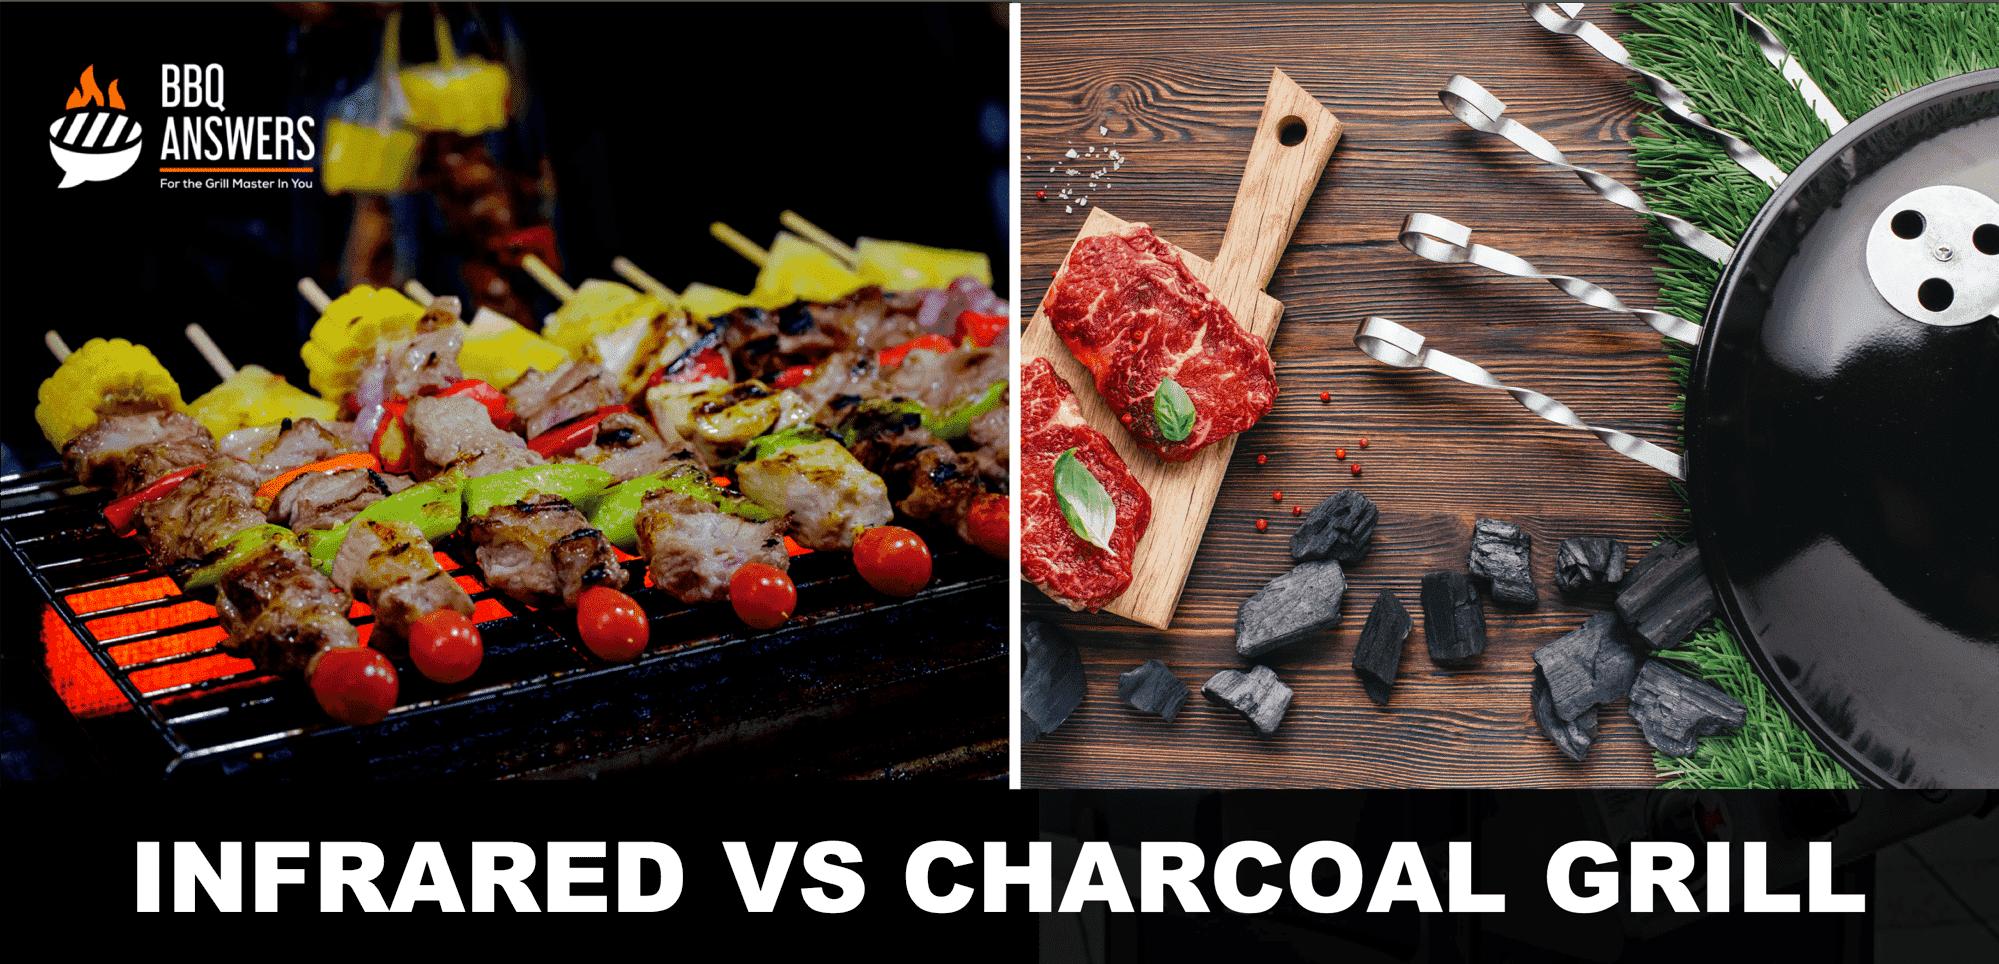 Infrared Vs. Charcoal Grills: Latest Tech Vs. Greatest Taste